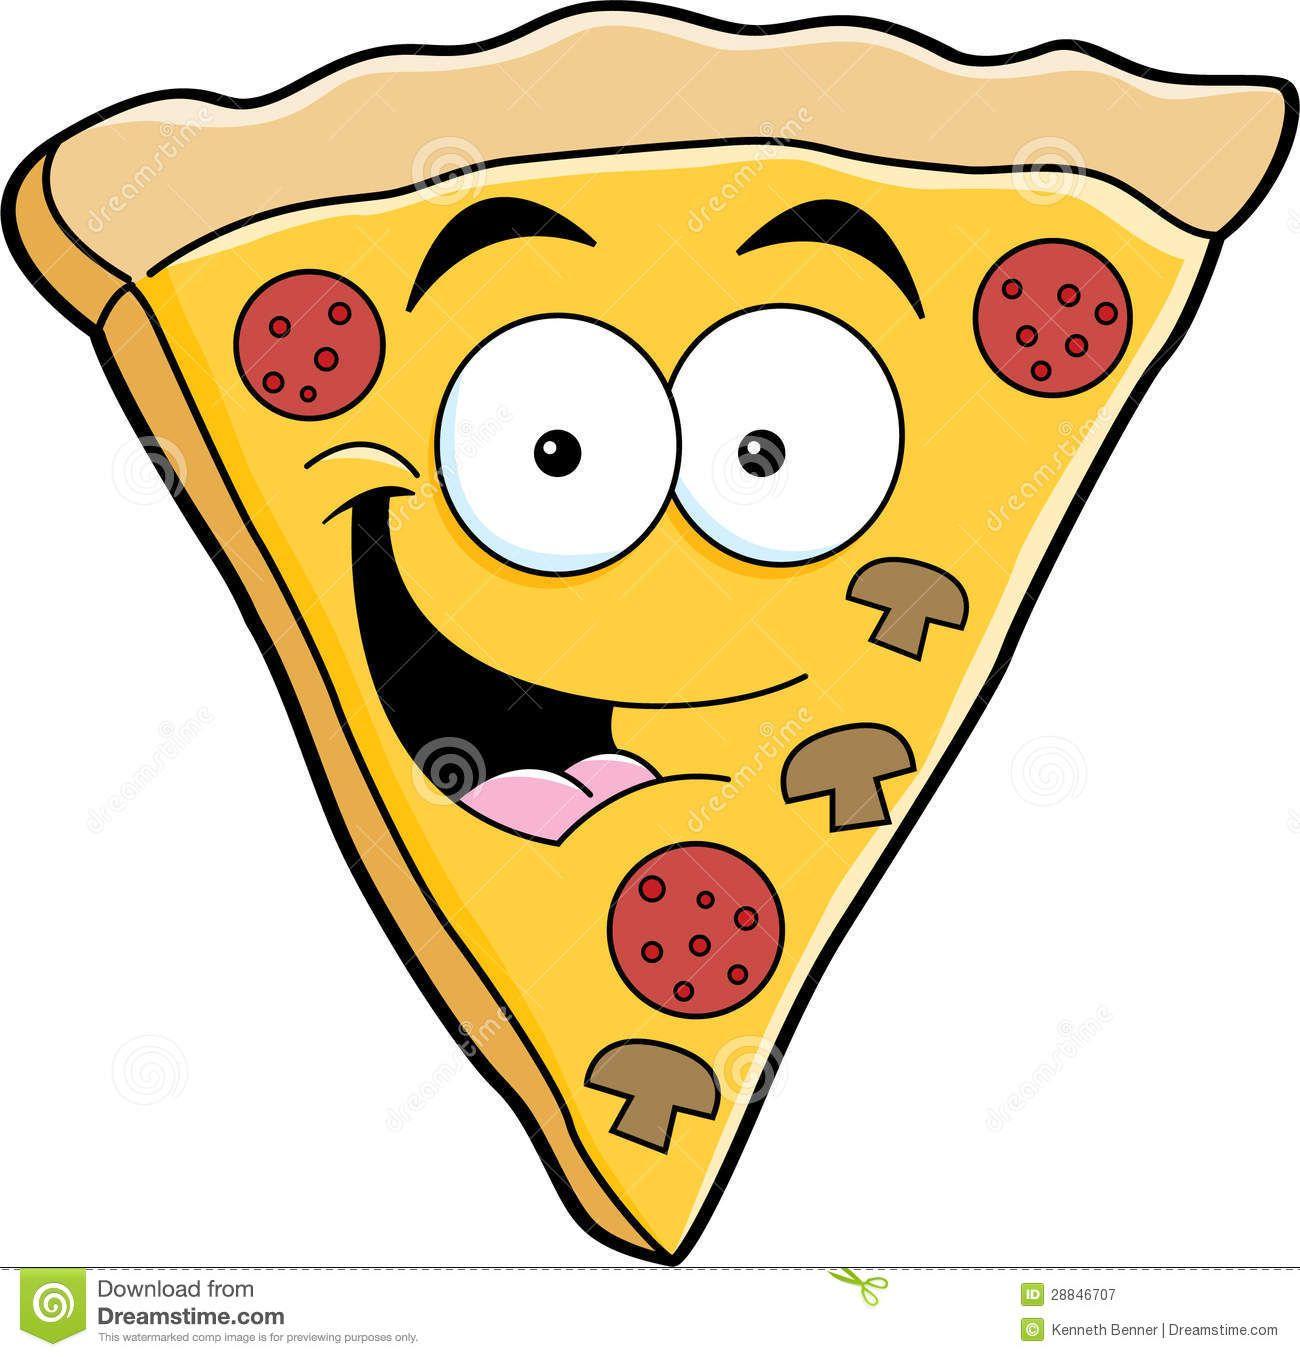 Pizza Cartoon Clipart Panda Free Clipart Images Pizza Cartoon Cartoon Pizza Slice Cartoon Clip Art